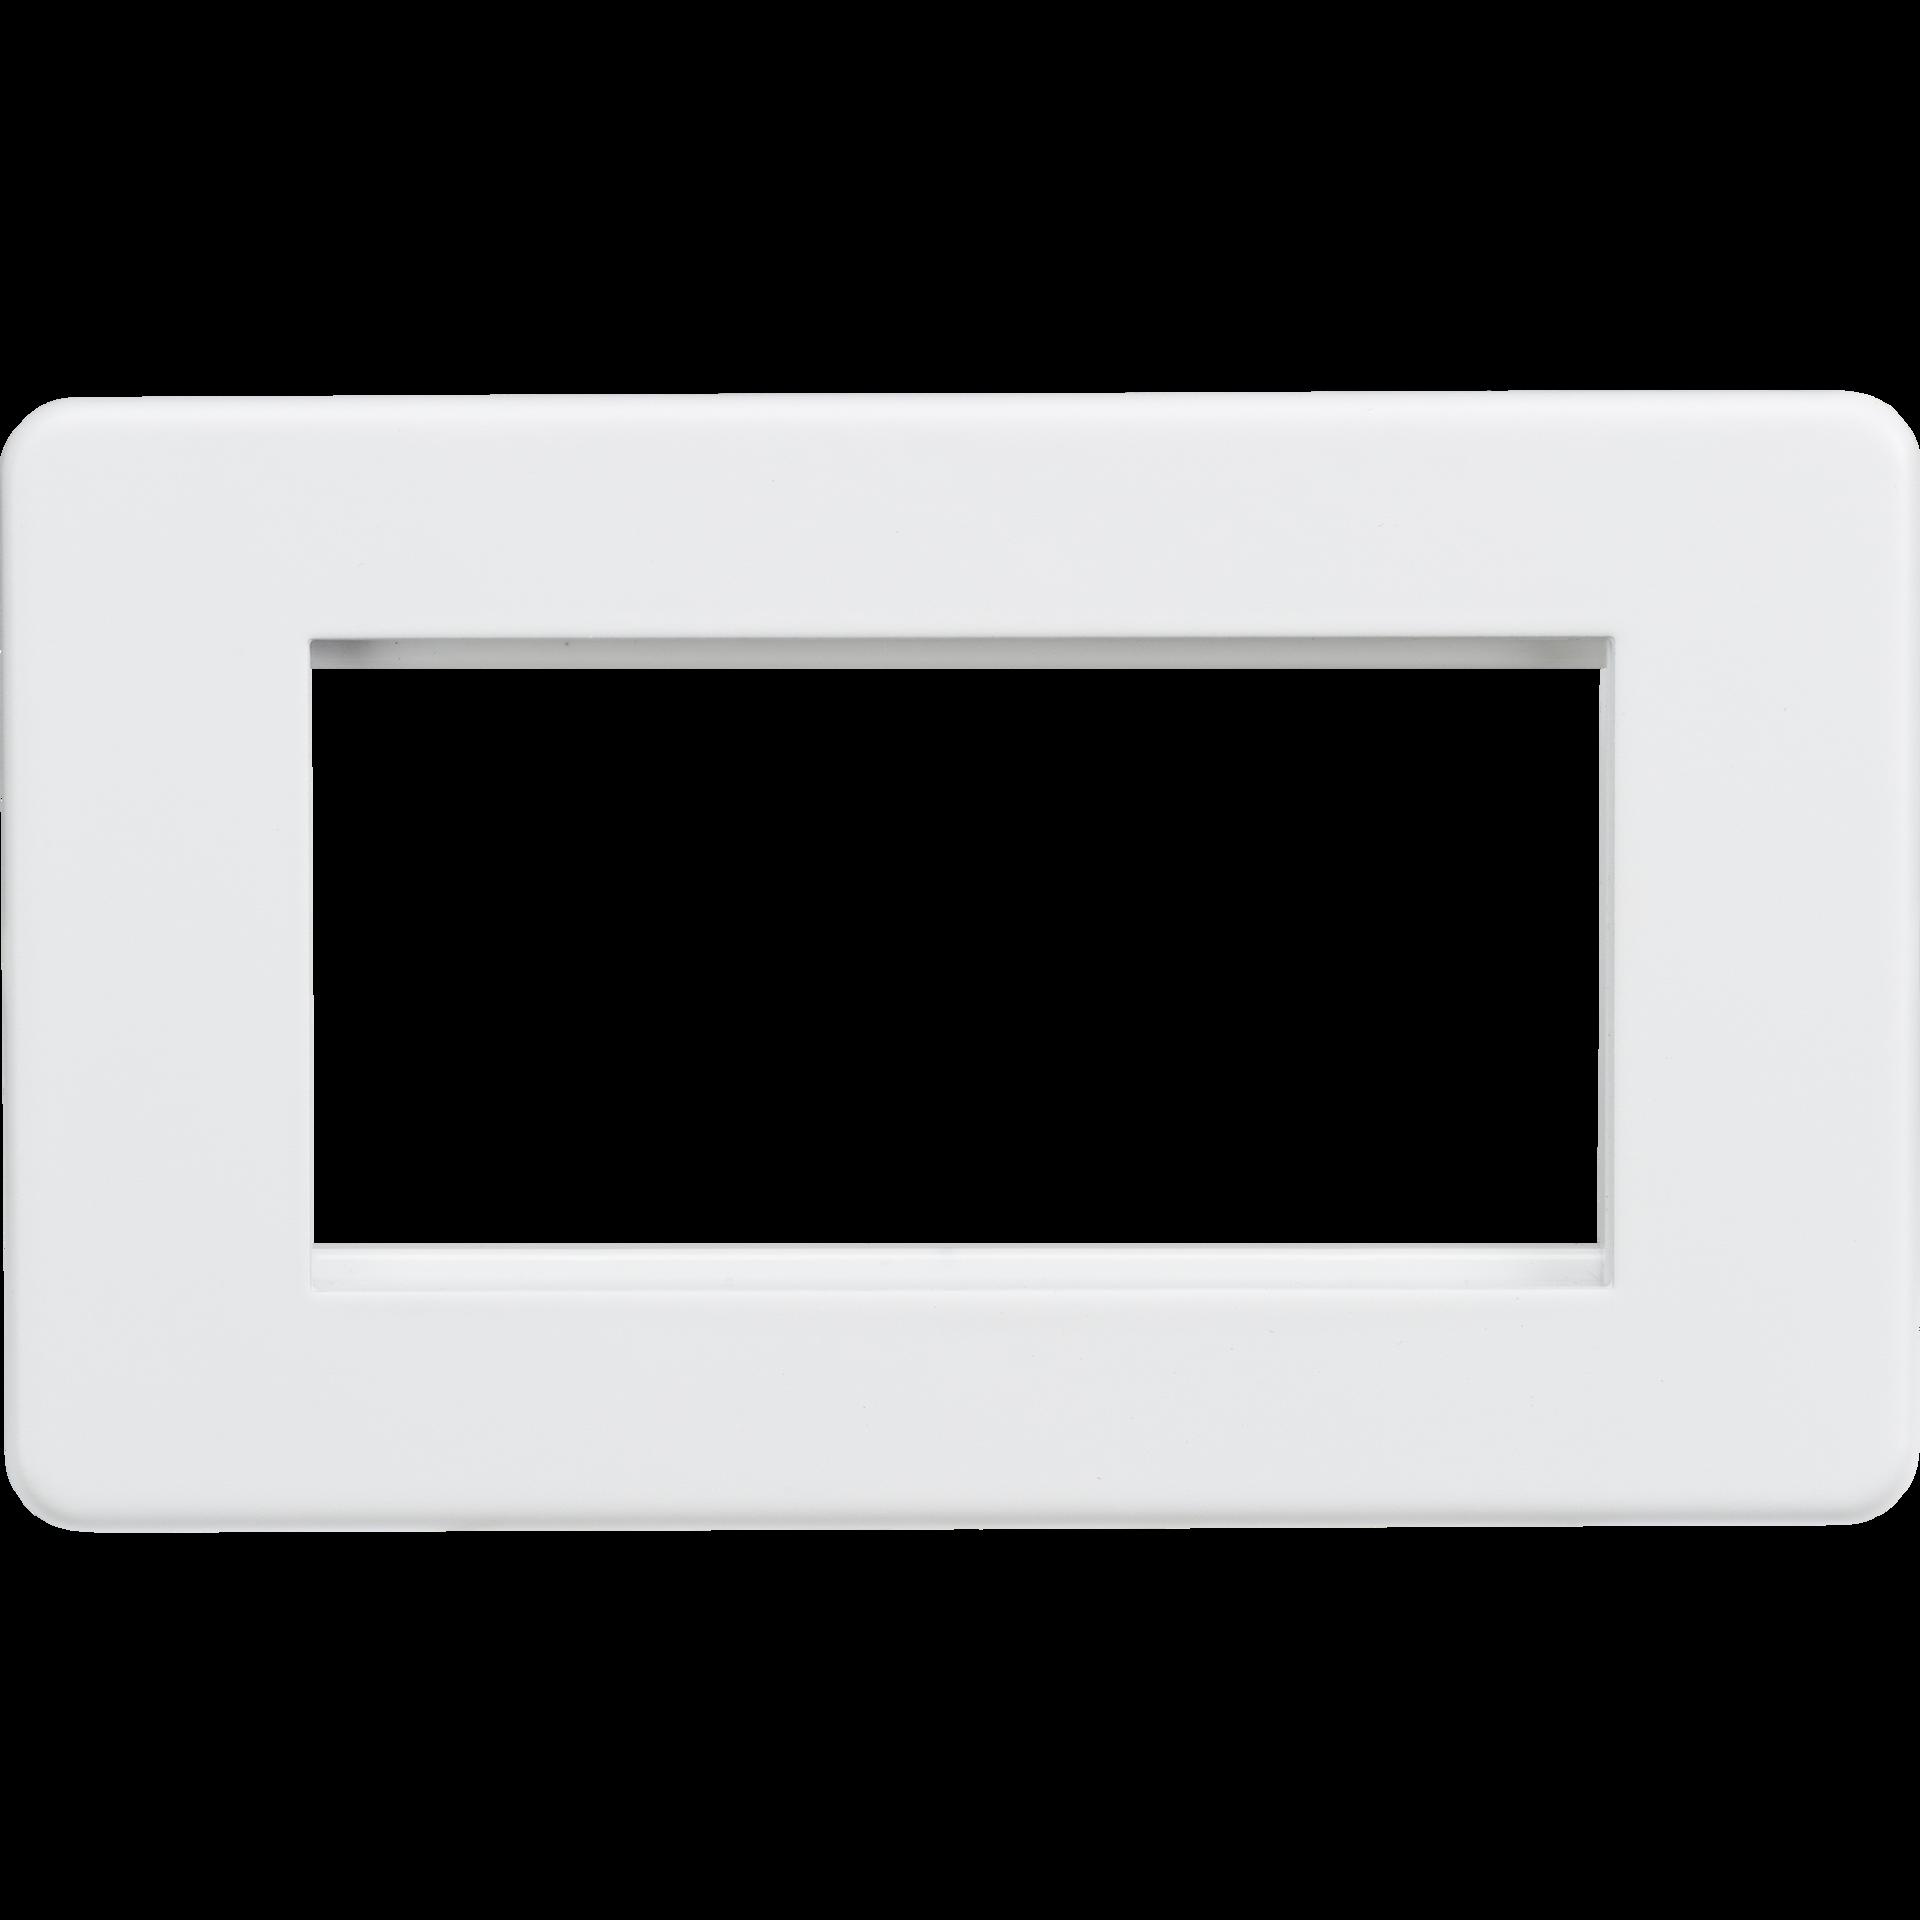 Outstanding White Modular Quadplexed Sat1 Sat2 Tv Fm Dab Outlet Wimbledon Wiring Digital Resources Jebrpkbiperorg